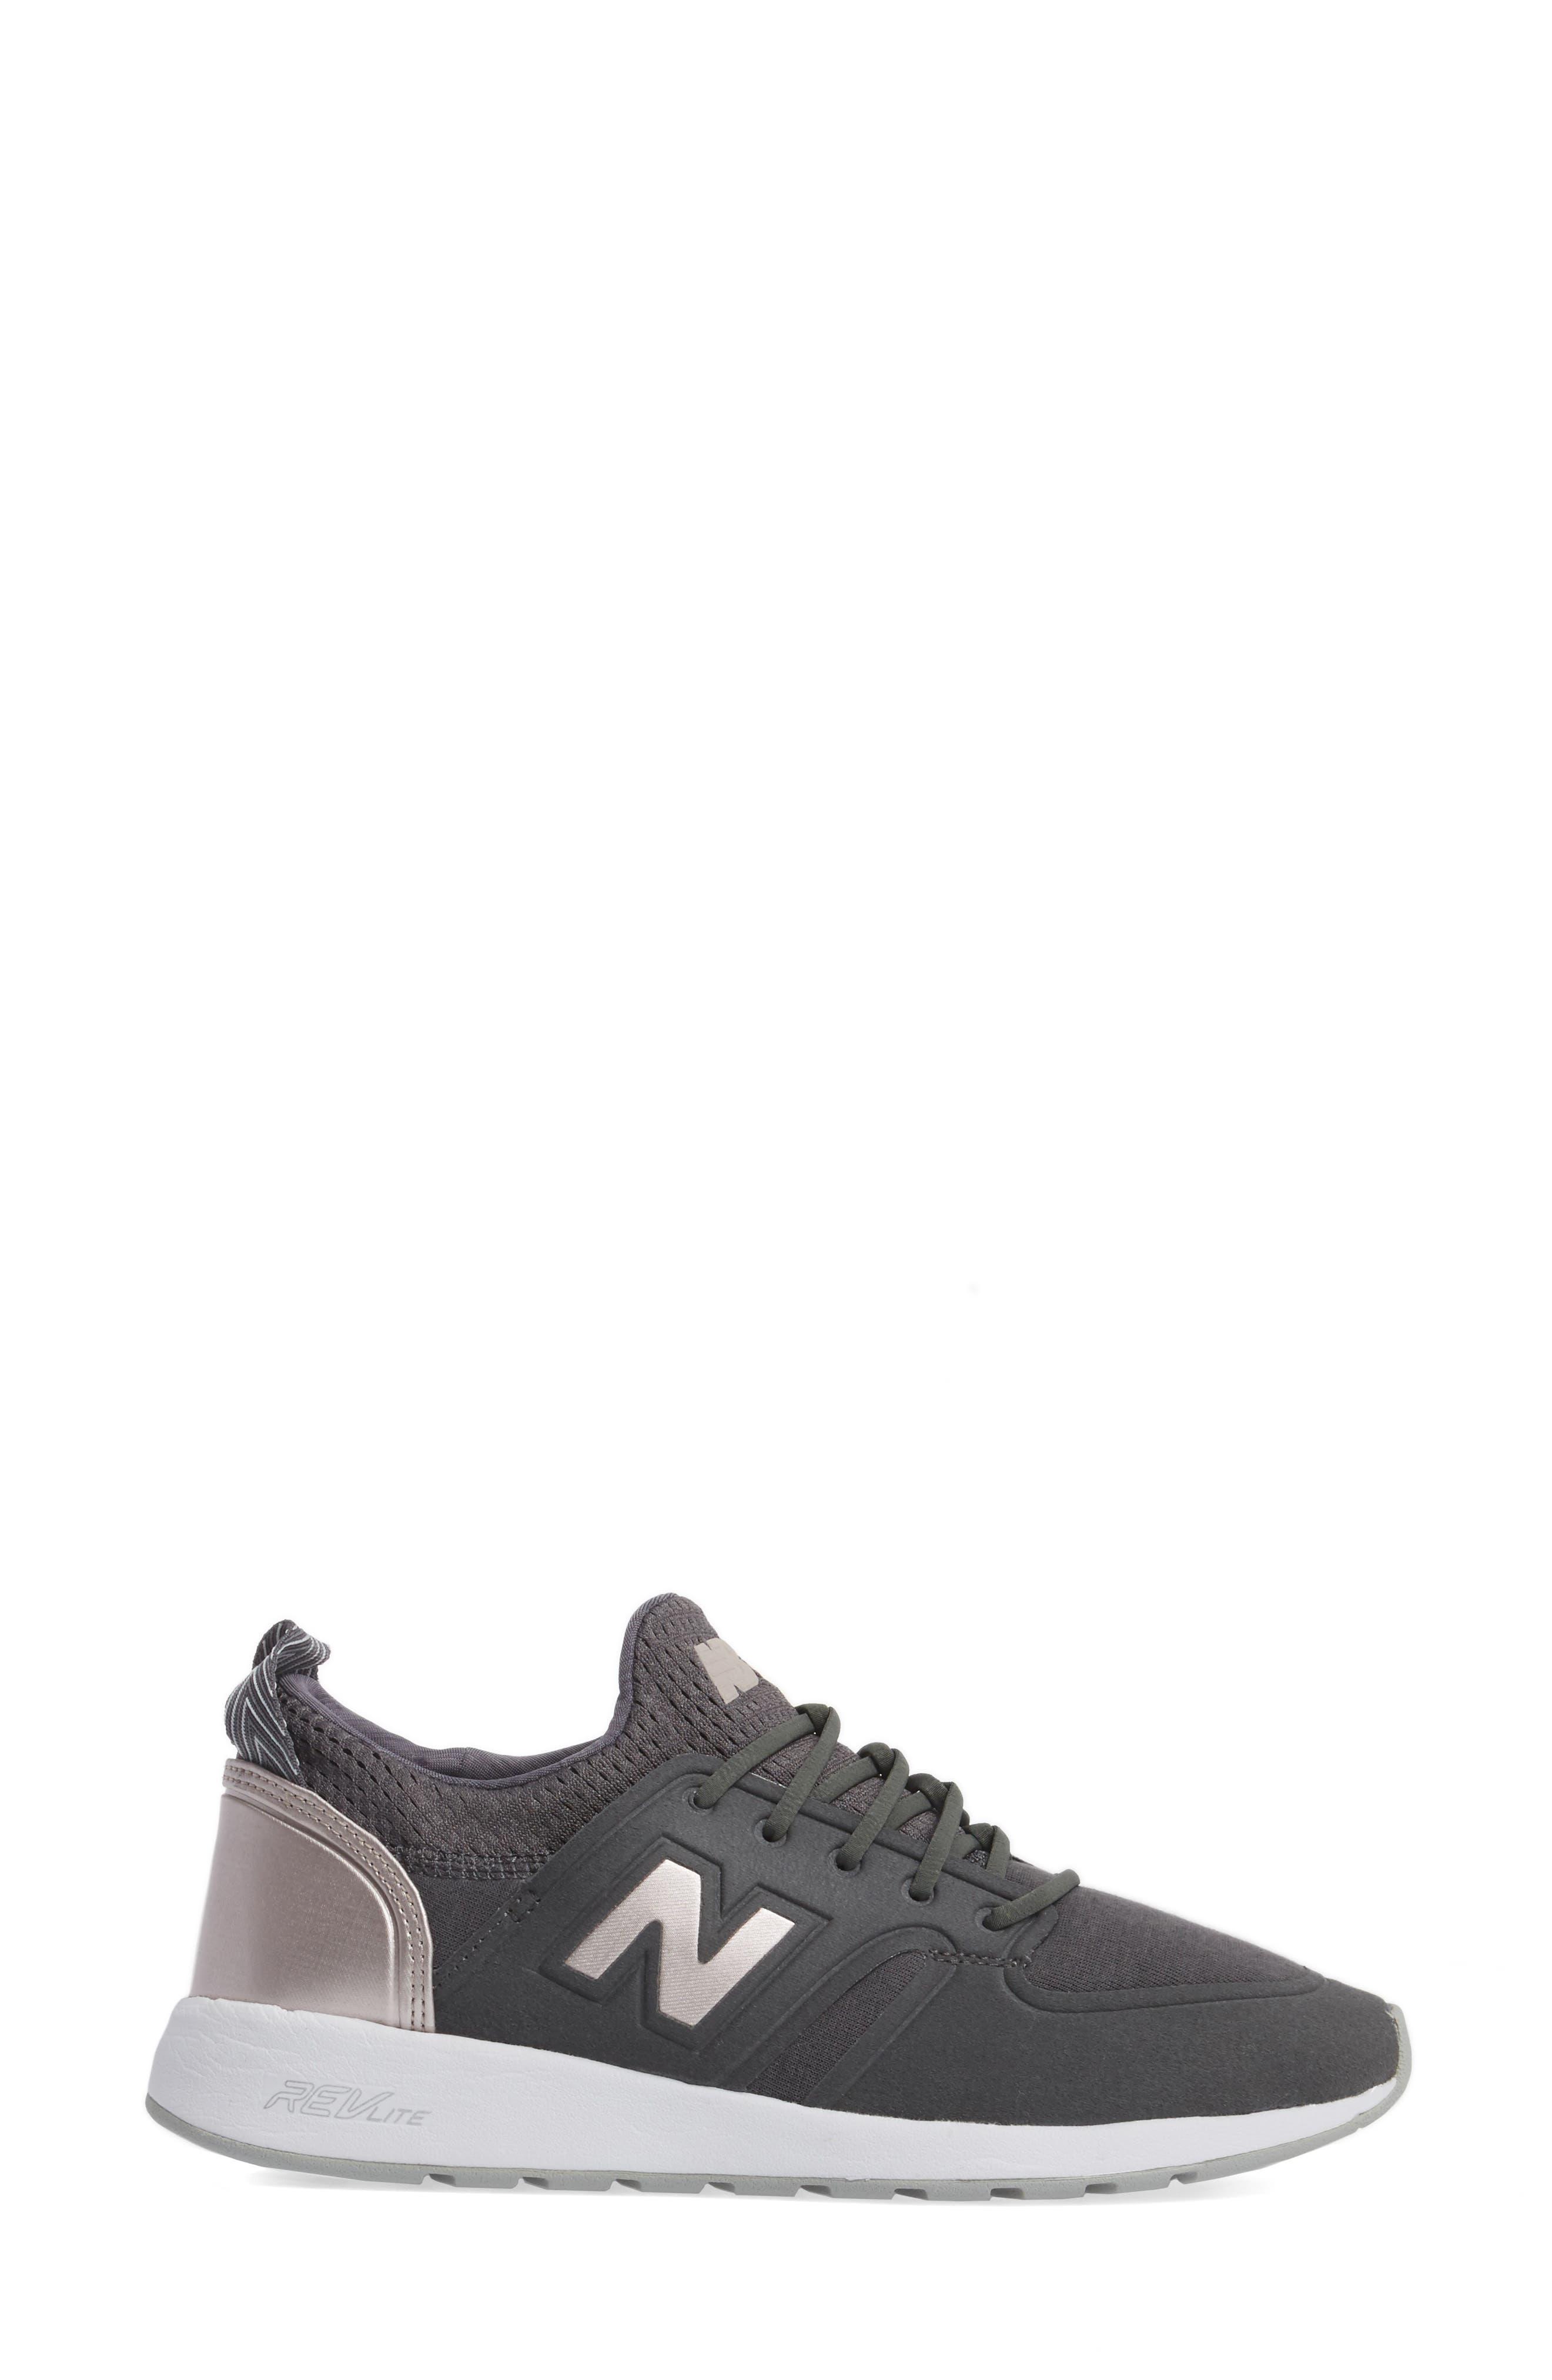 NEW BALANCE, '420' Sneaker, Alternate thumbnail 3, color, 021